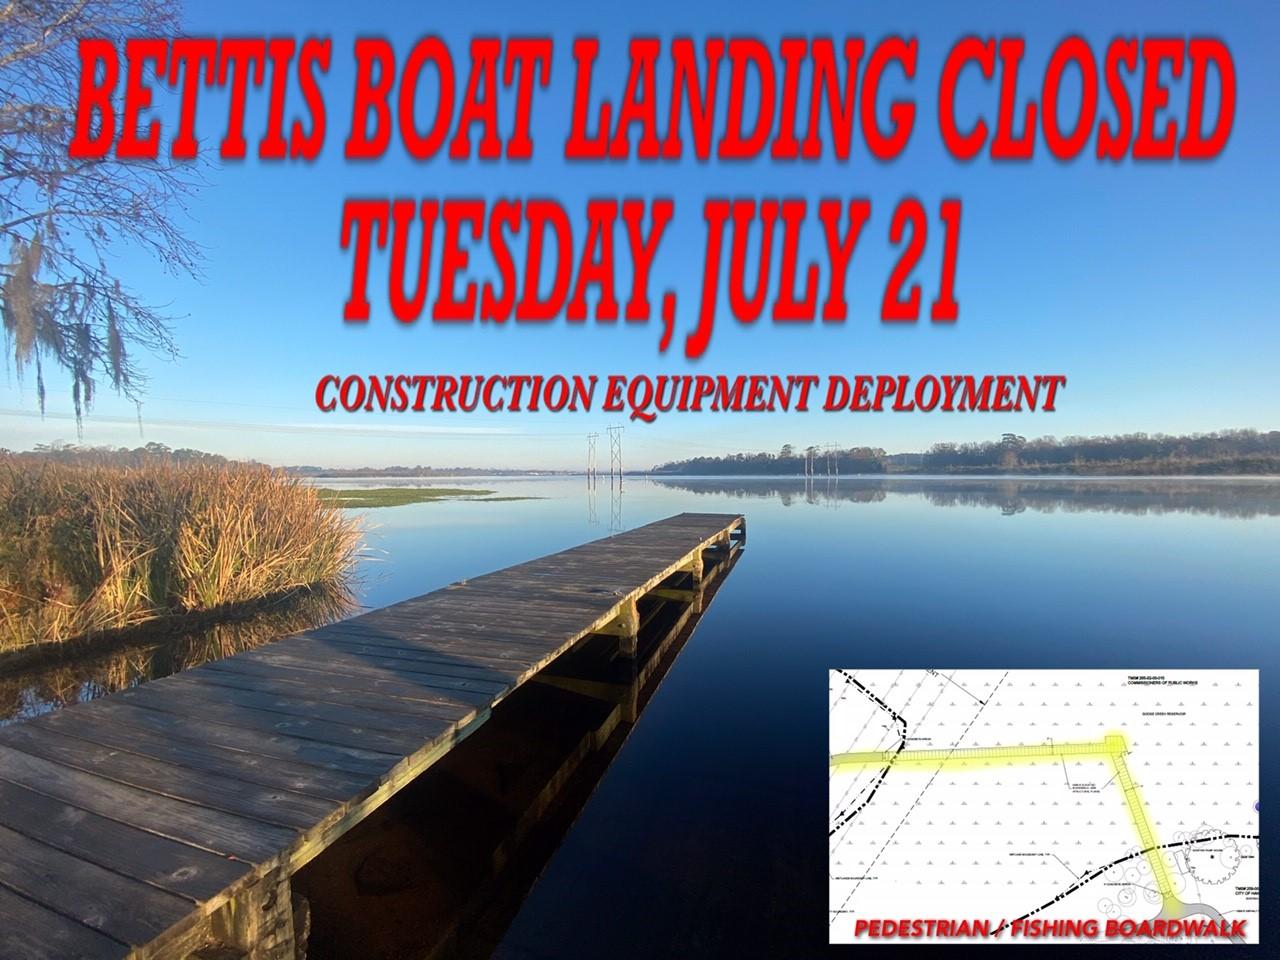 Boat Landing Closed July 21st